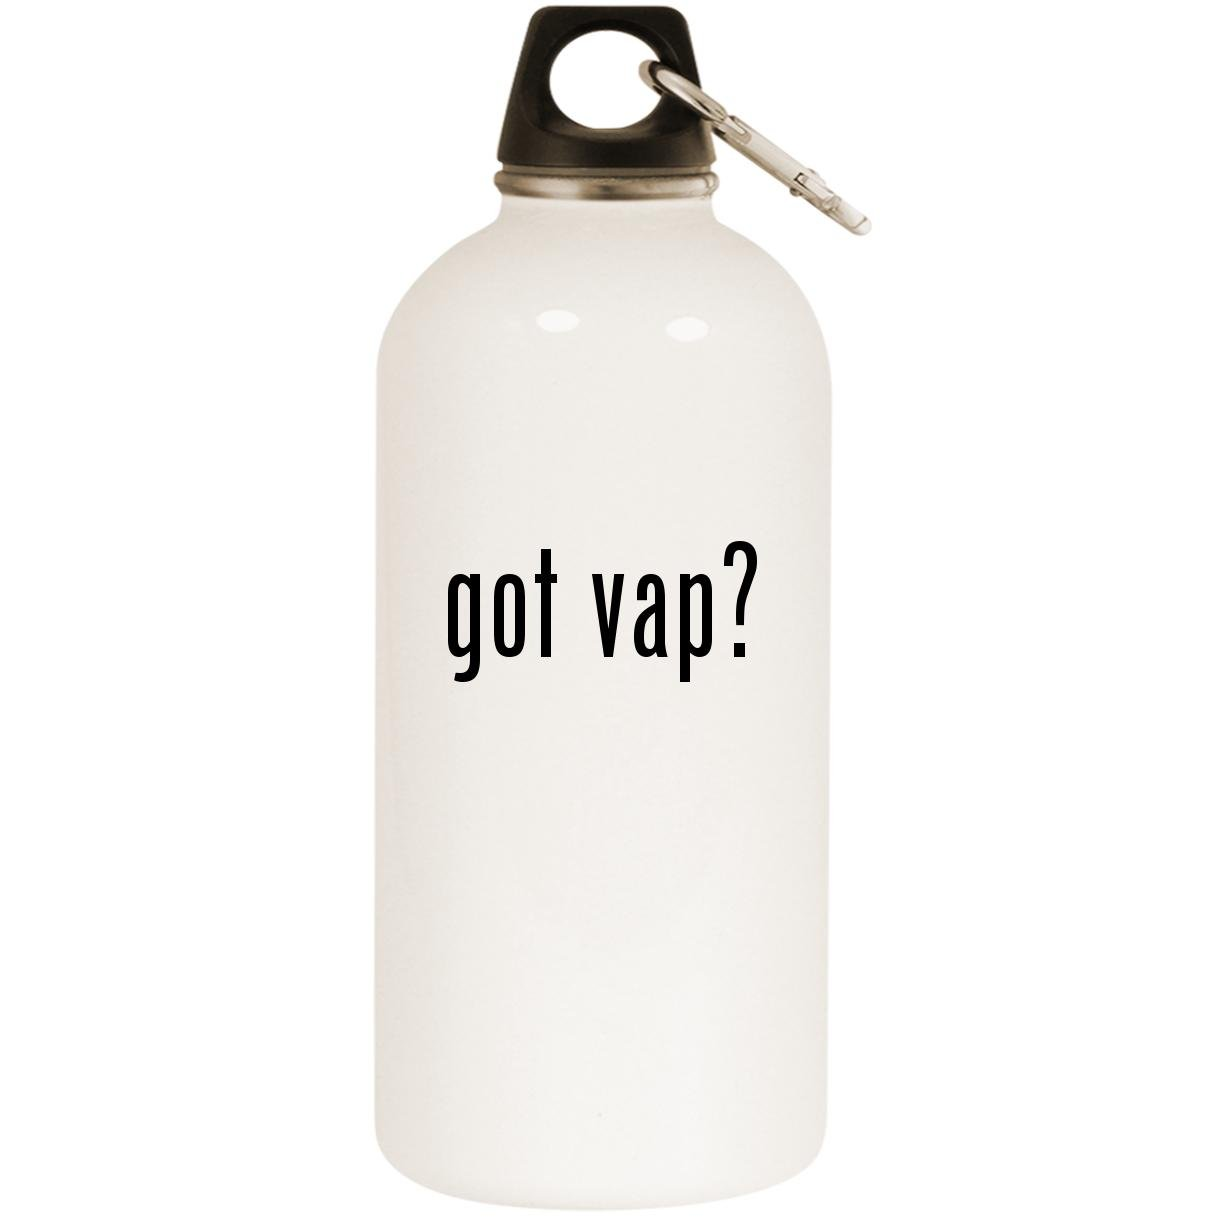 got vap? - White 20oz Stainless Steel Water Bottle with Carabiner